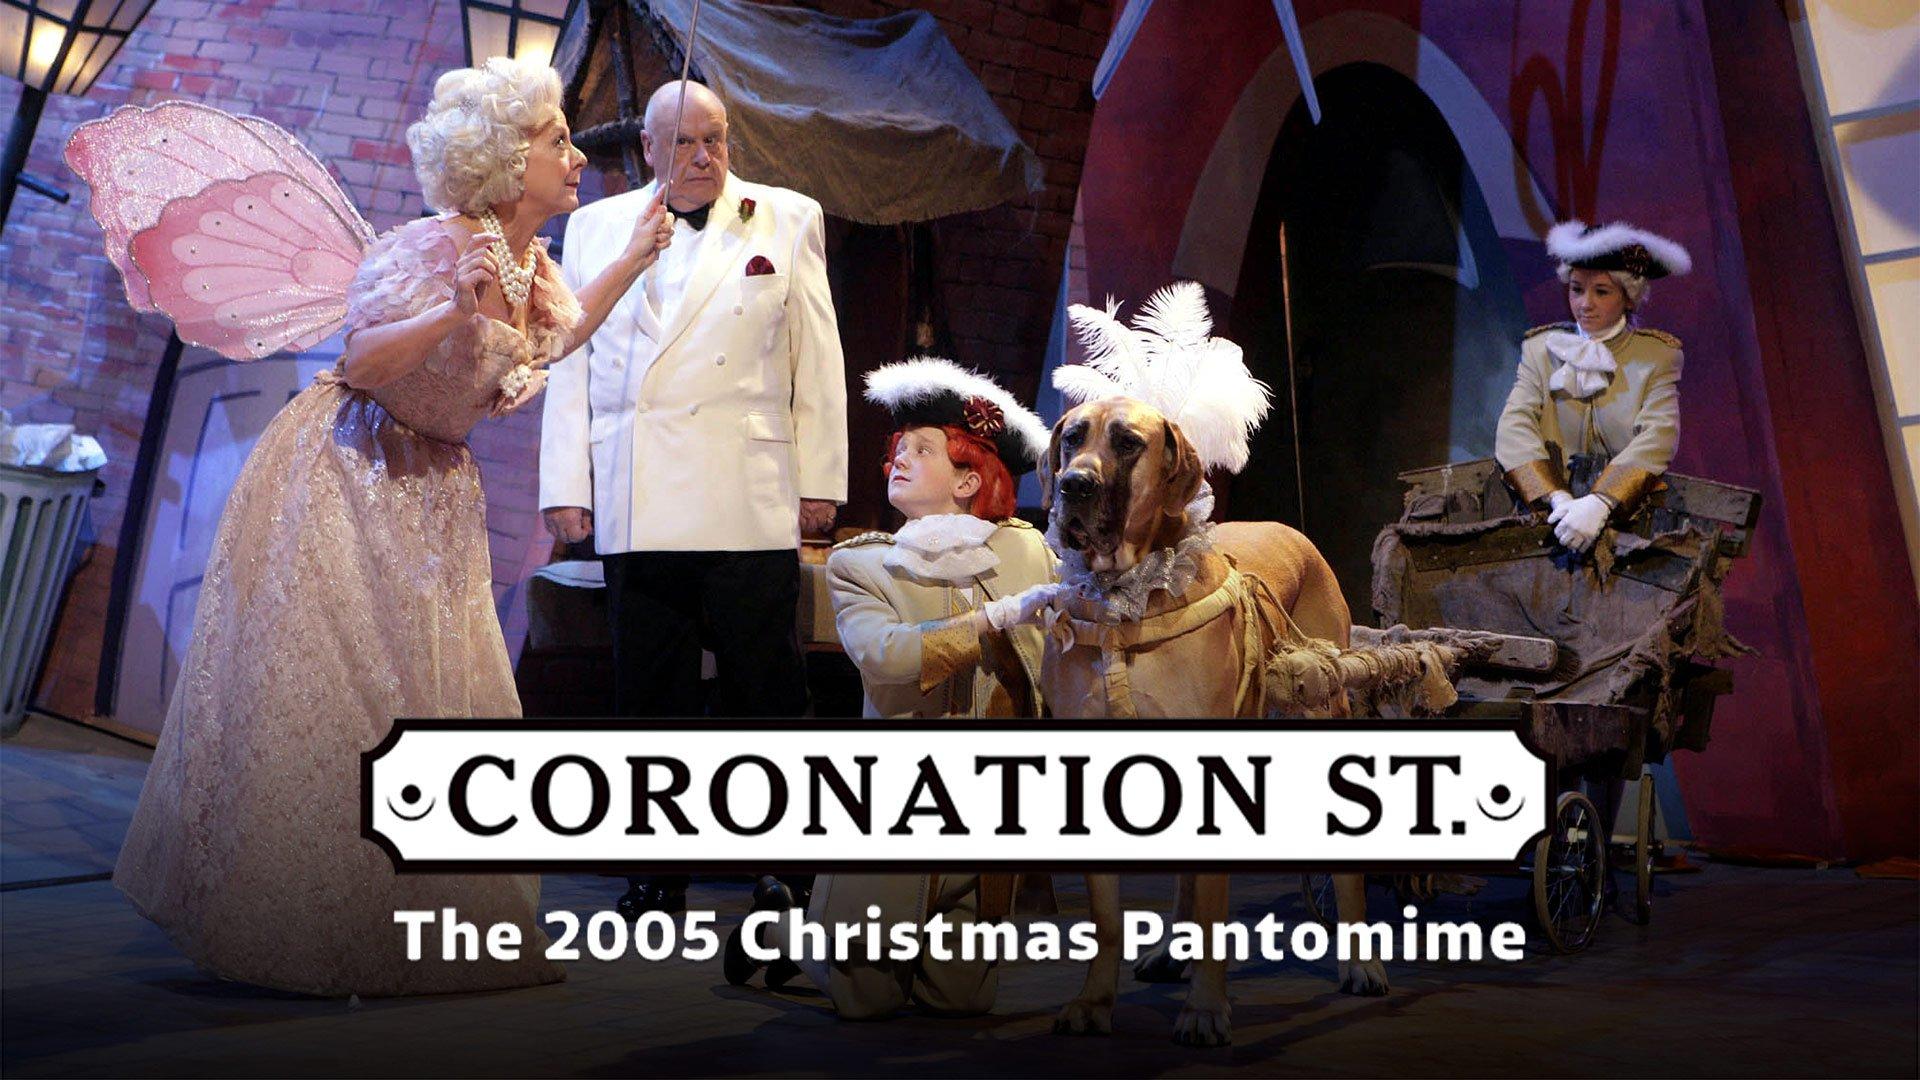 Coronation Street: The 2005 Christmas Pantomime on BritBox UK